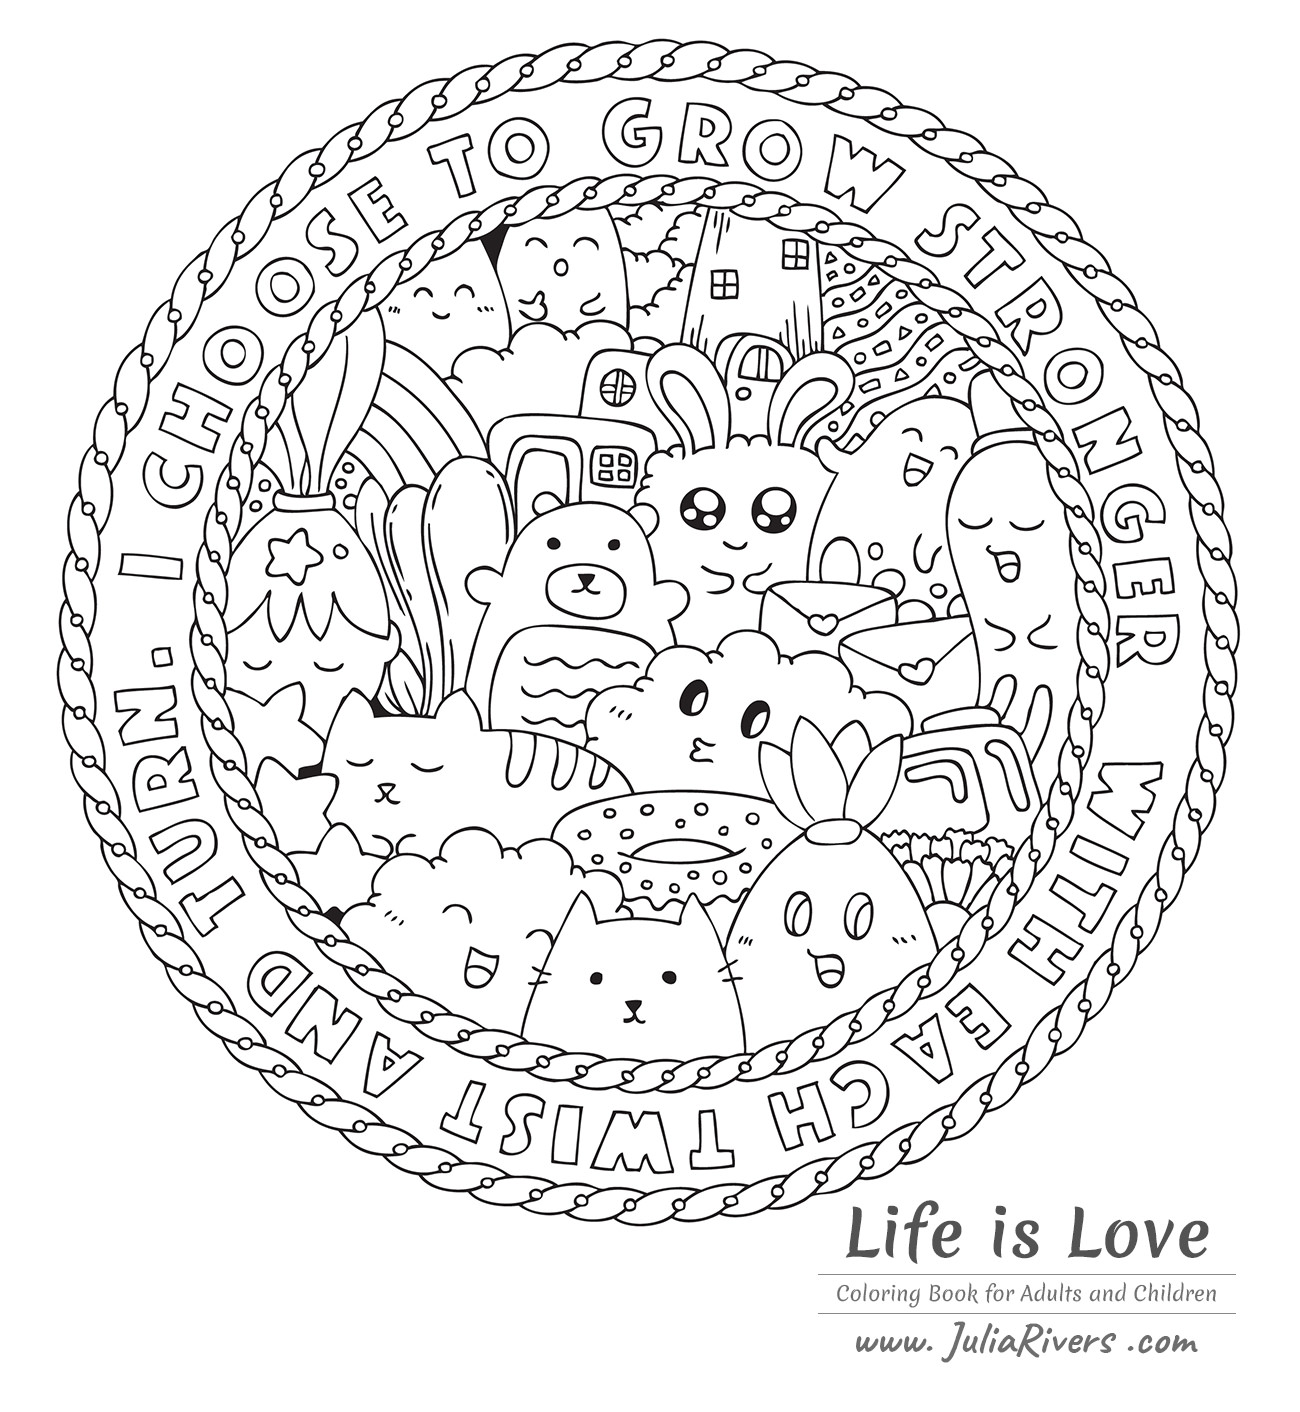 Doodle art doodling 36296